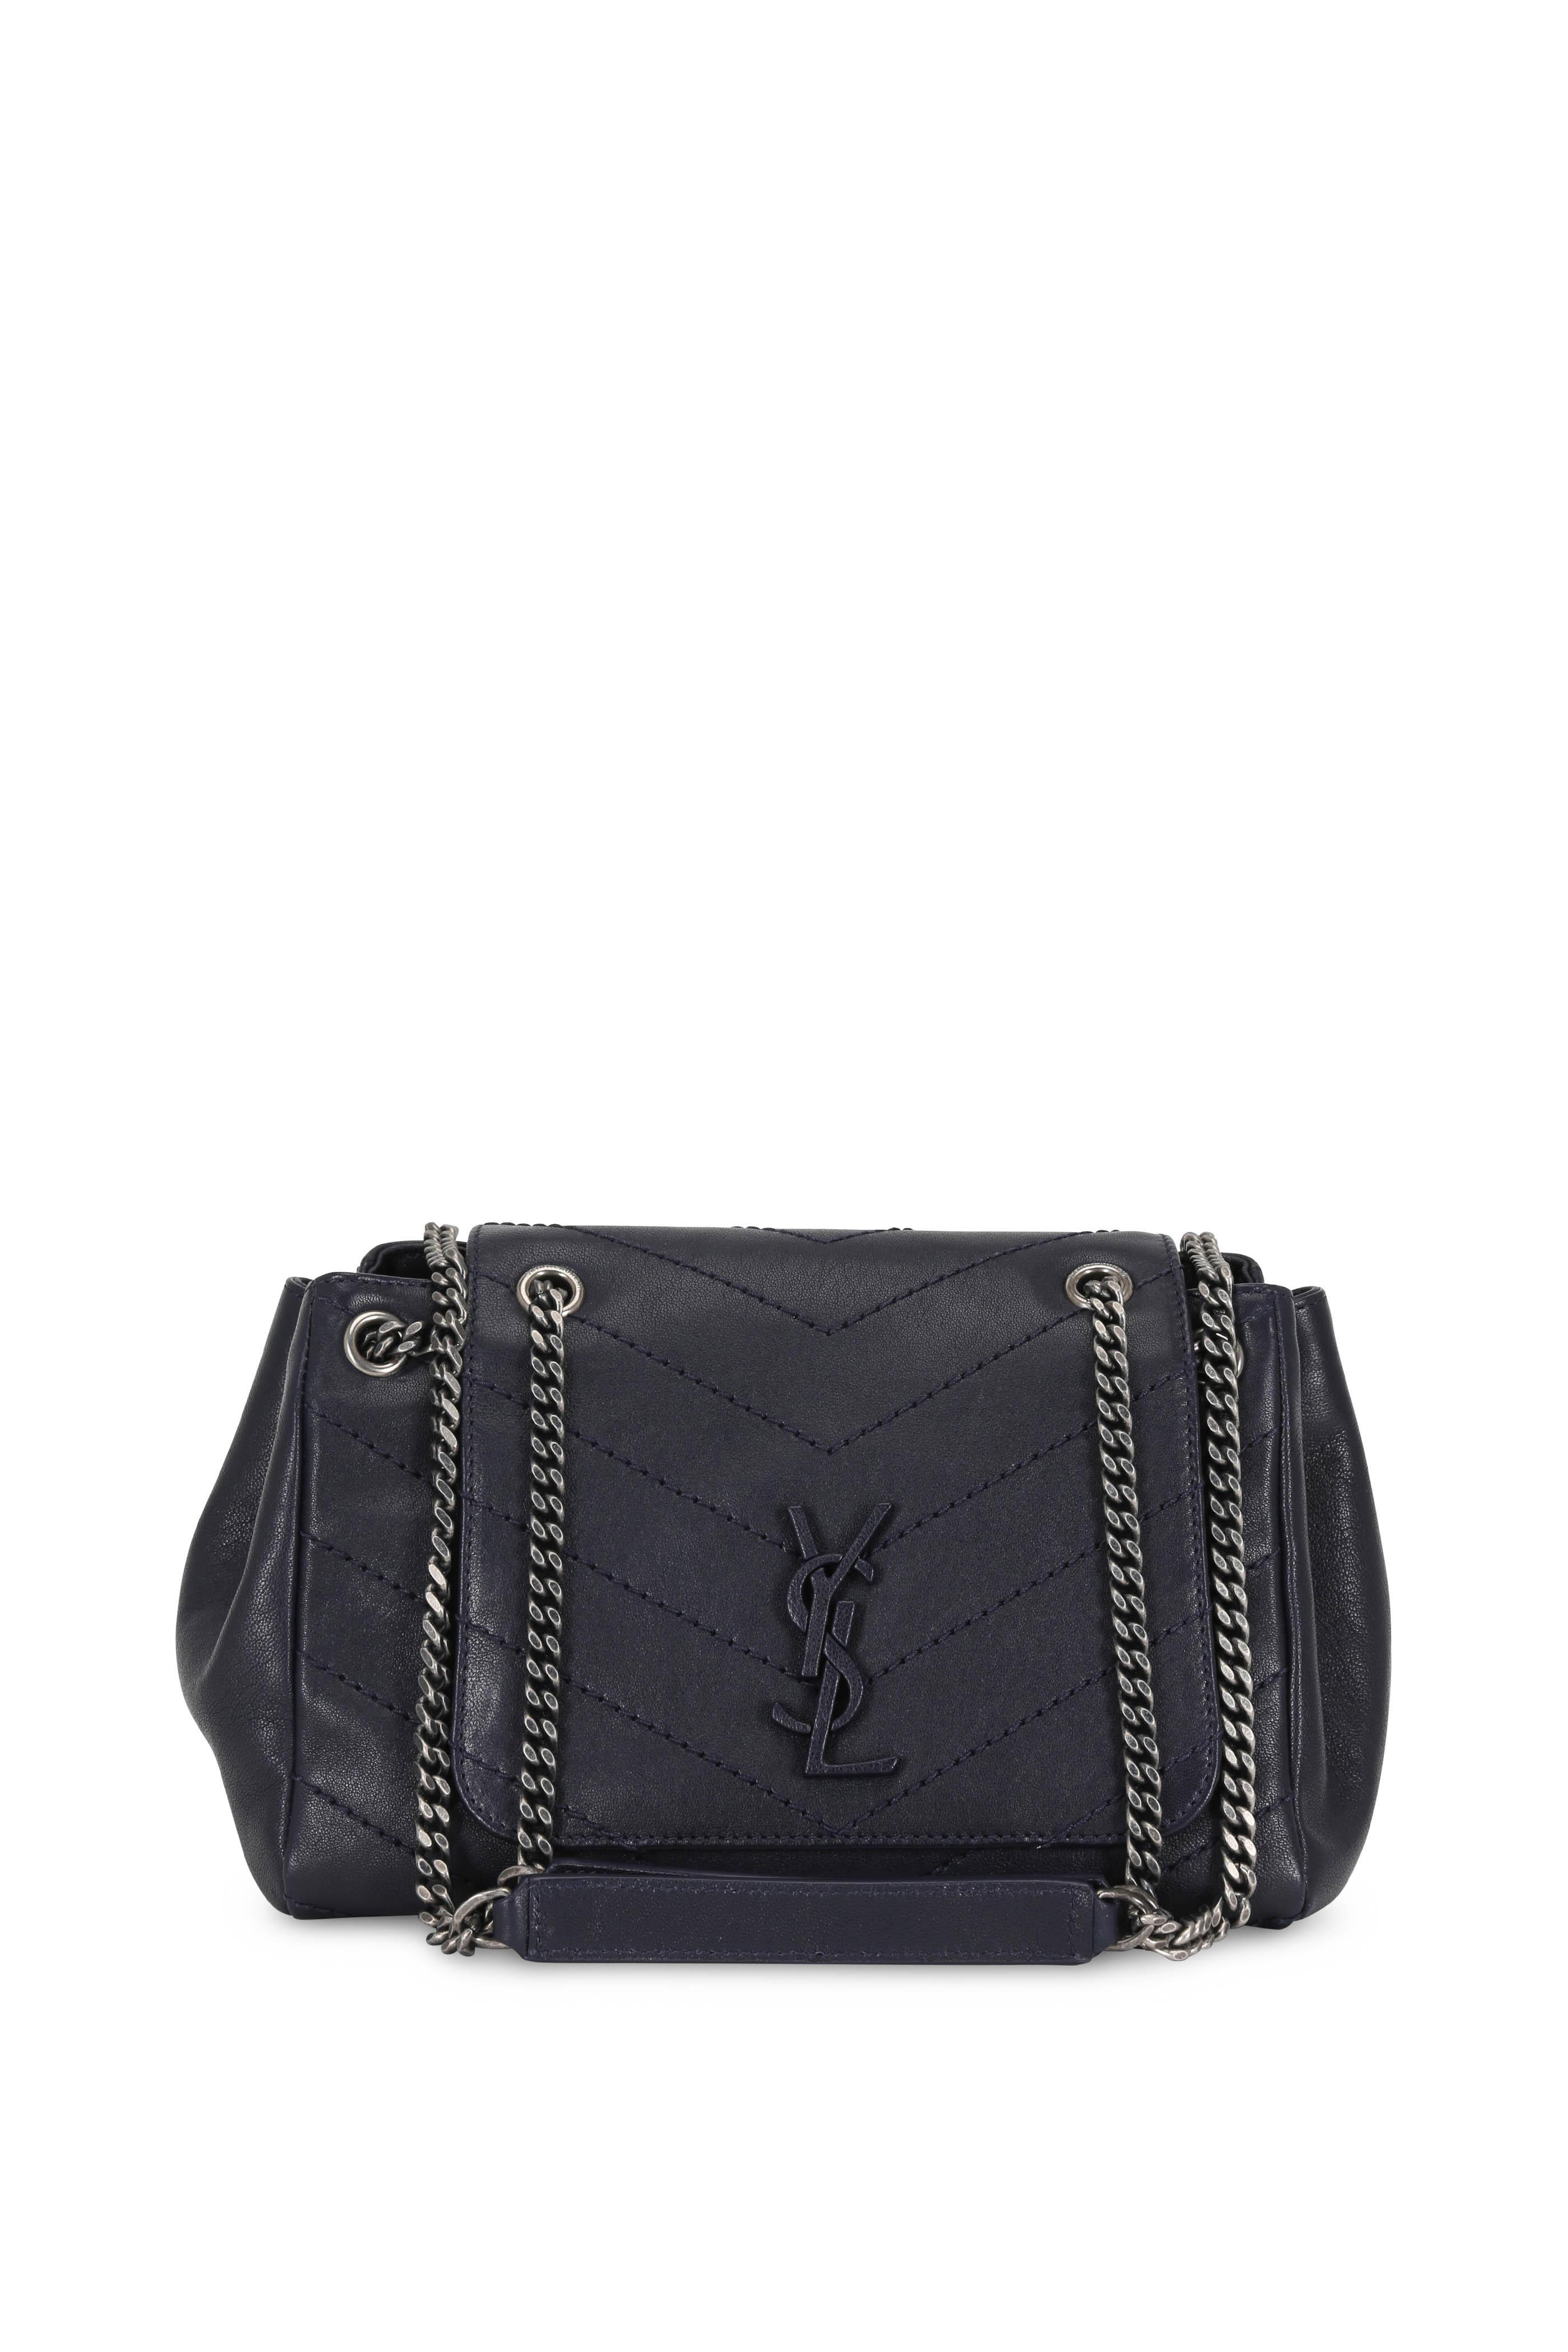 147d5305a1e6 Saint Laurent - Nolita Monogram Navy Blue Quilted Small Bag ...